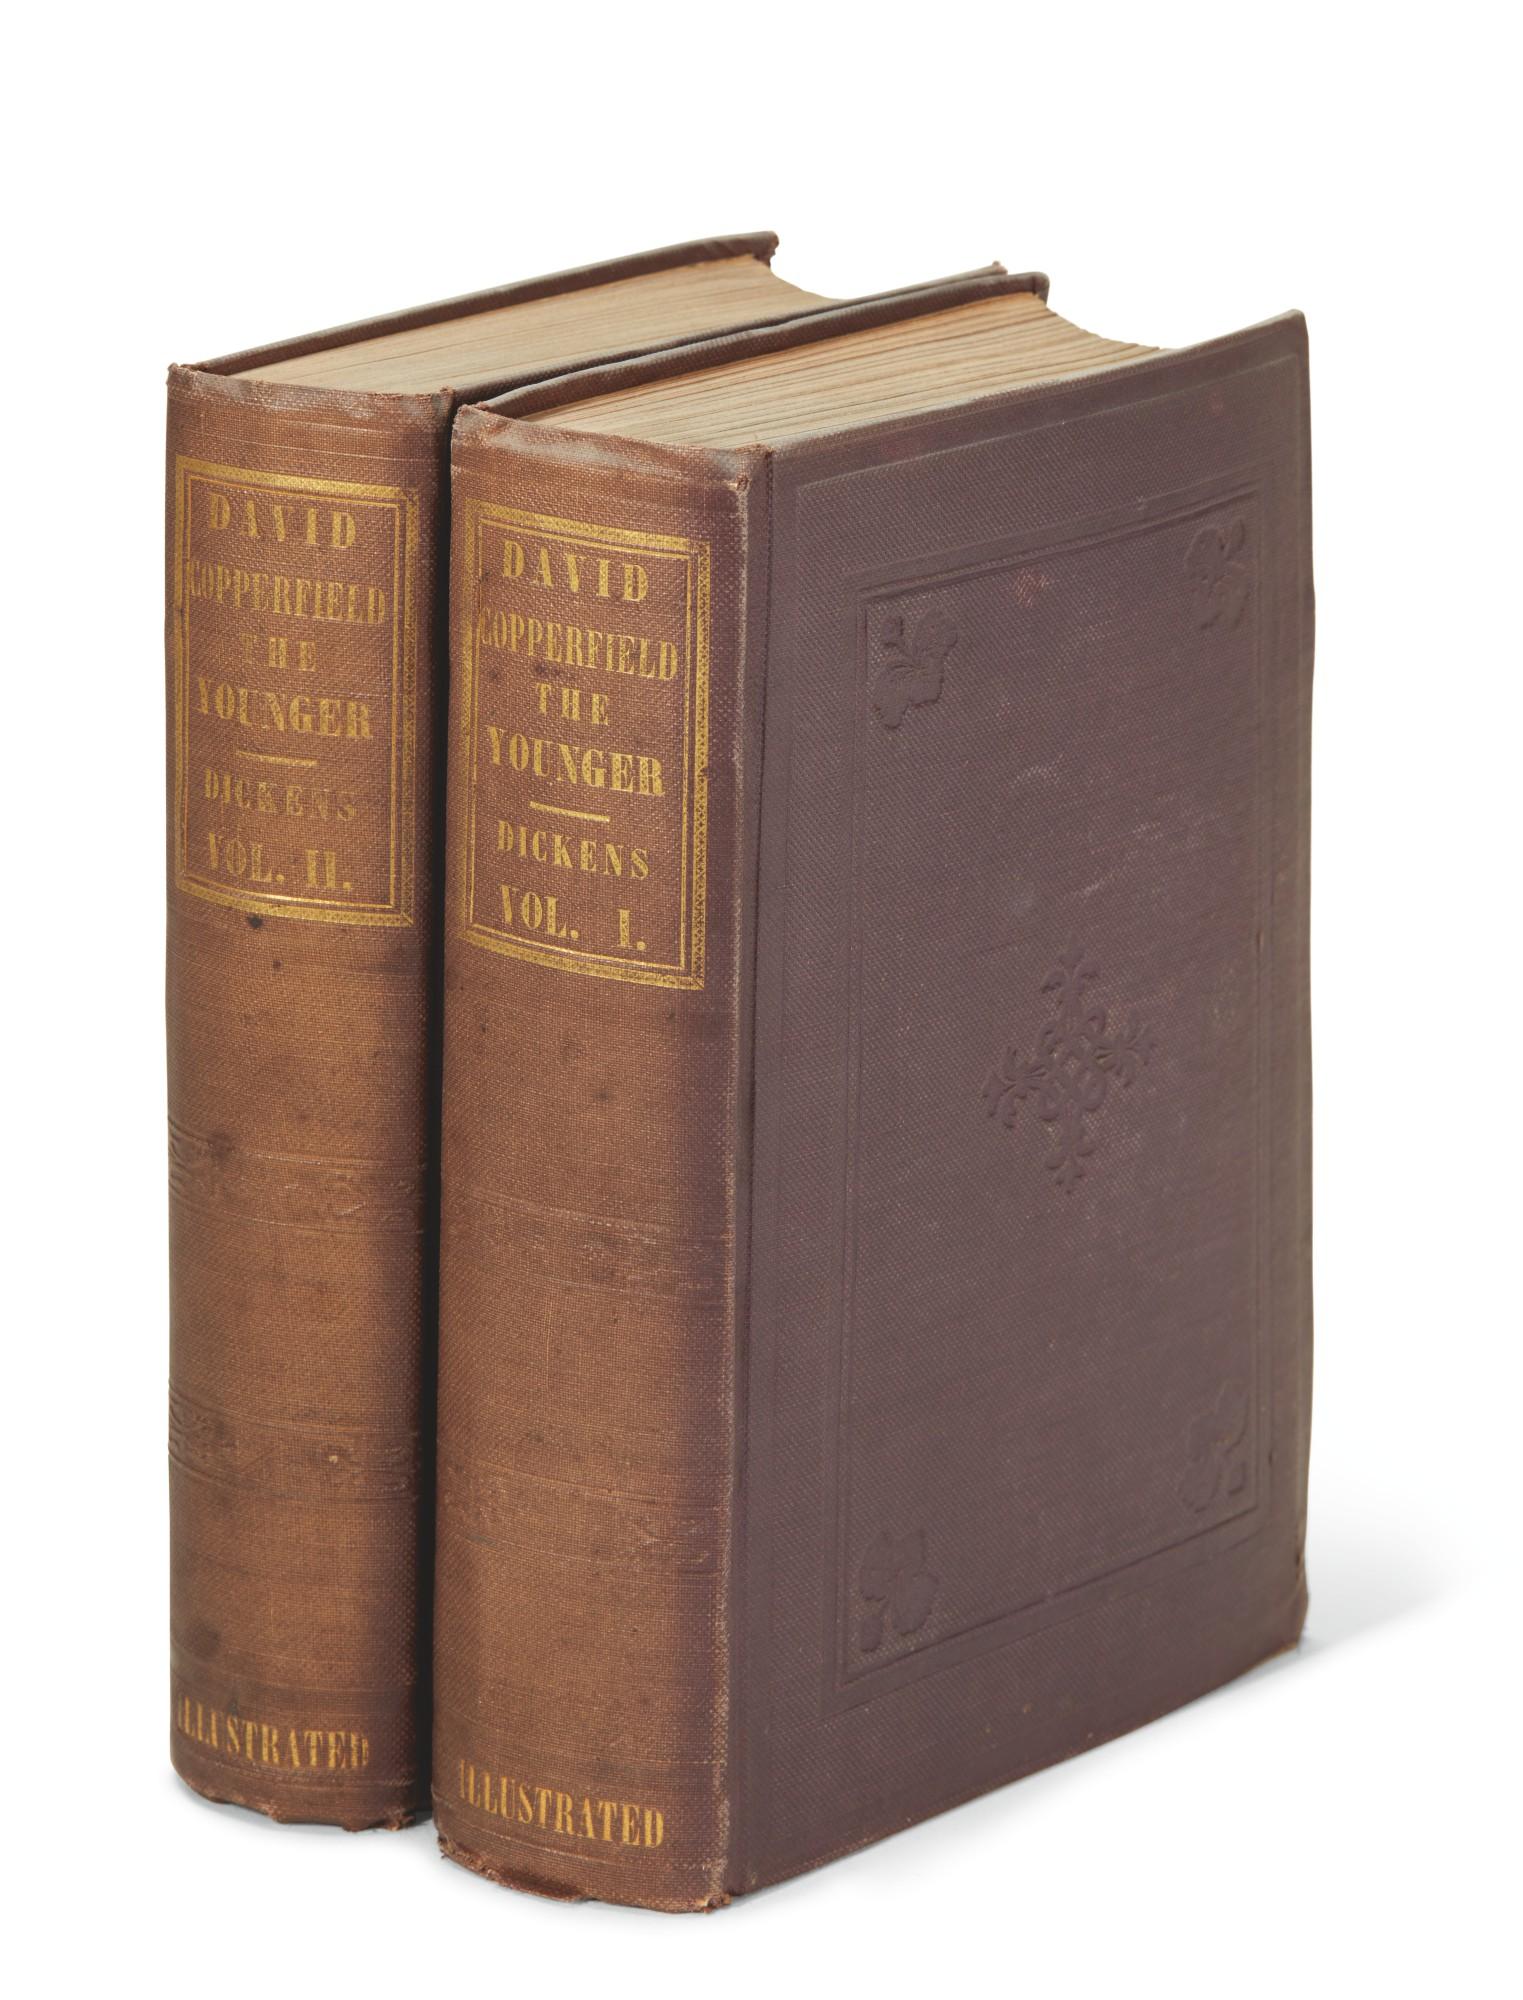 Dickens, David Copperfield, 1850, American edition